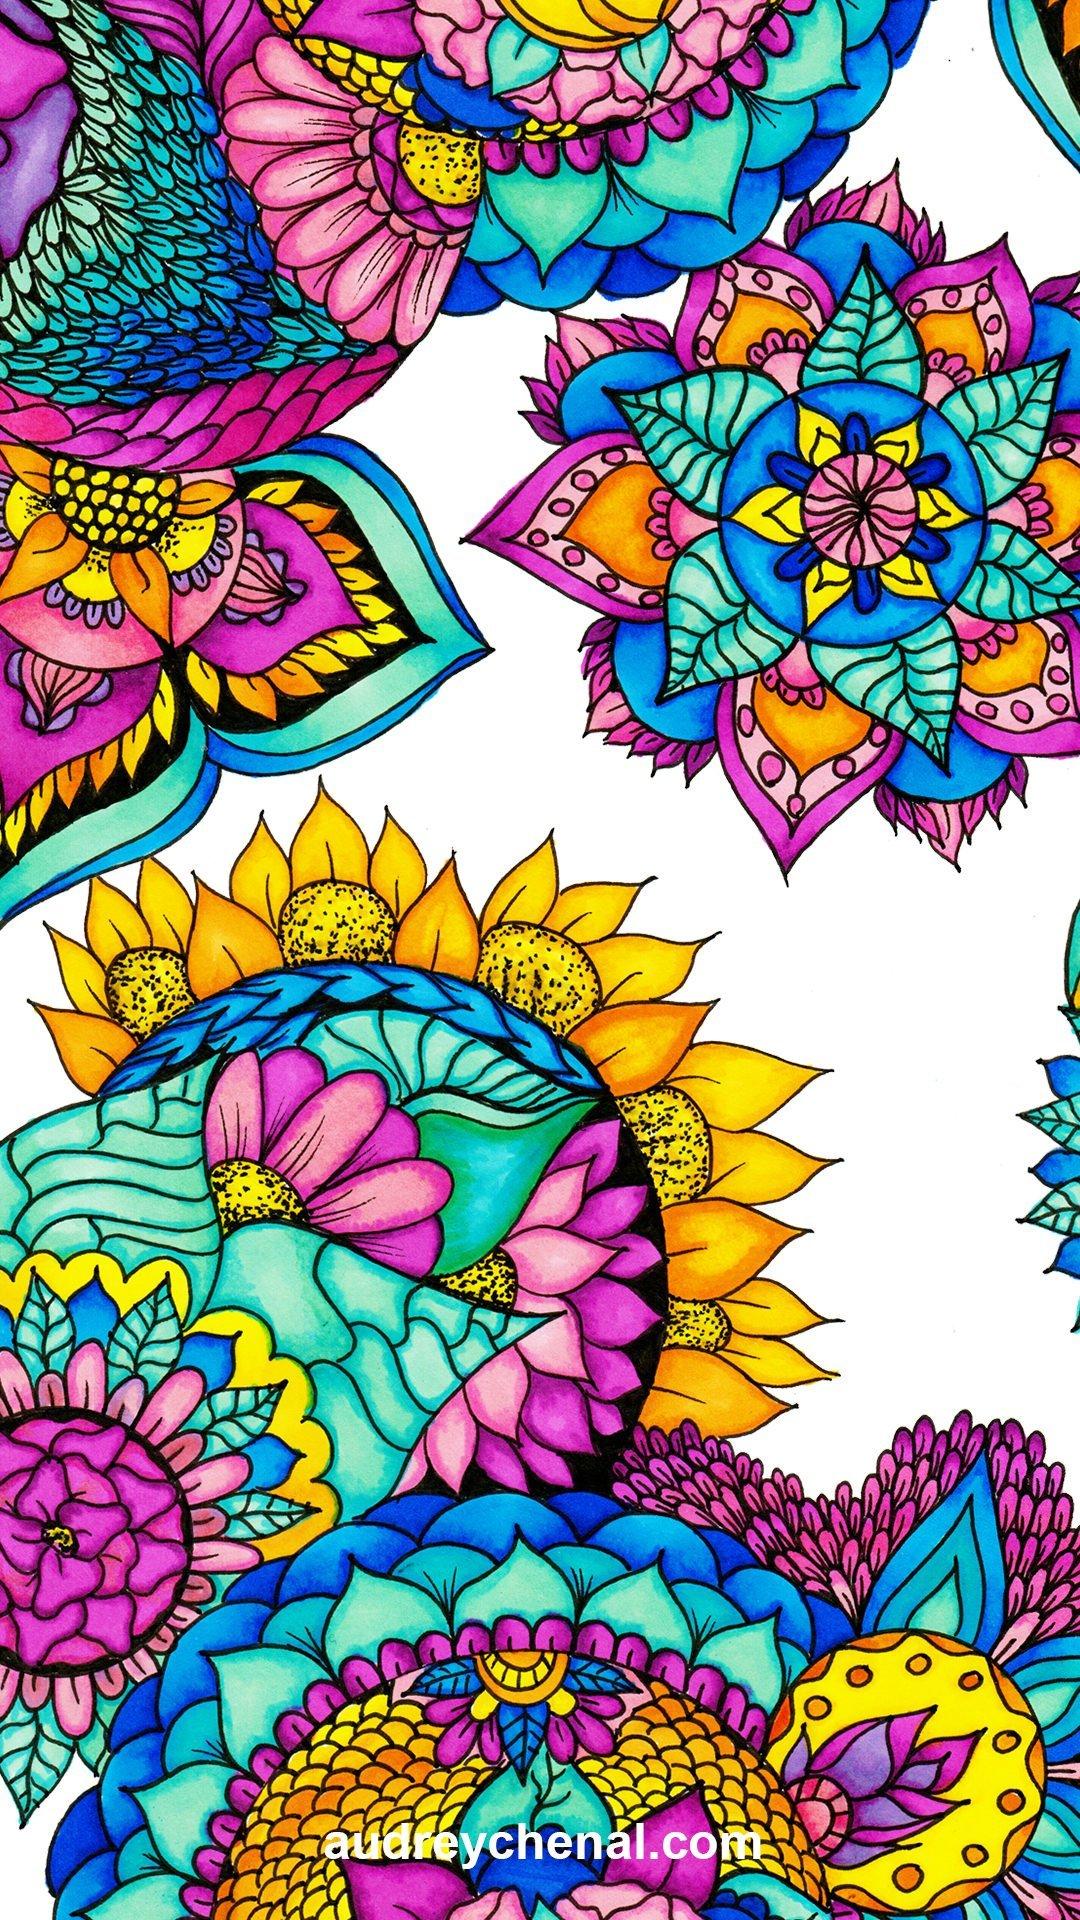 wallpaper handdrawn floral bright watercolor mandala illustration by Audrey Chenal